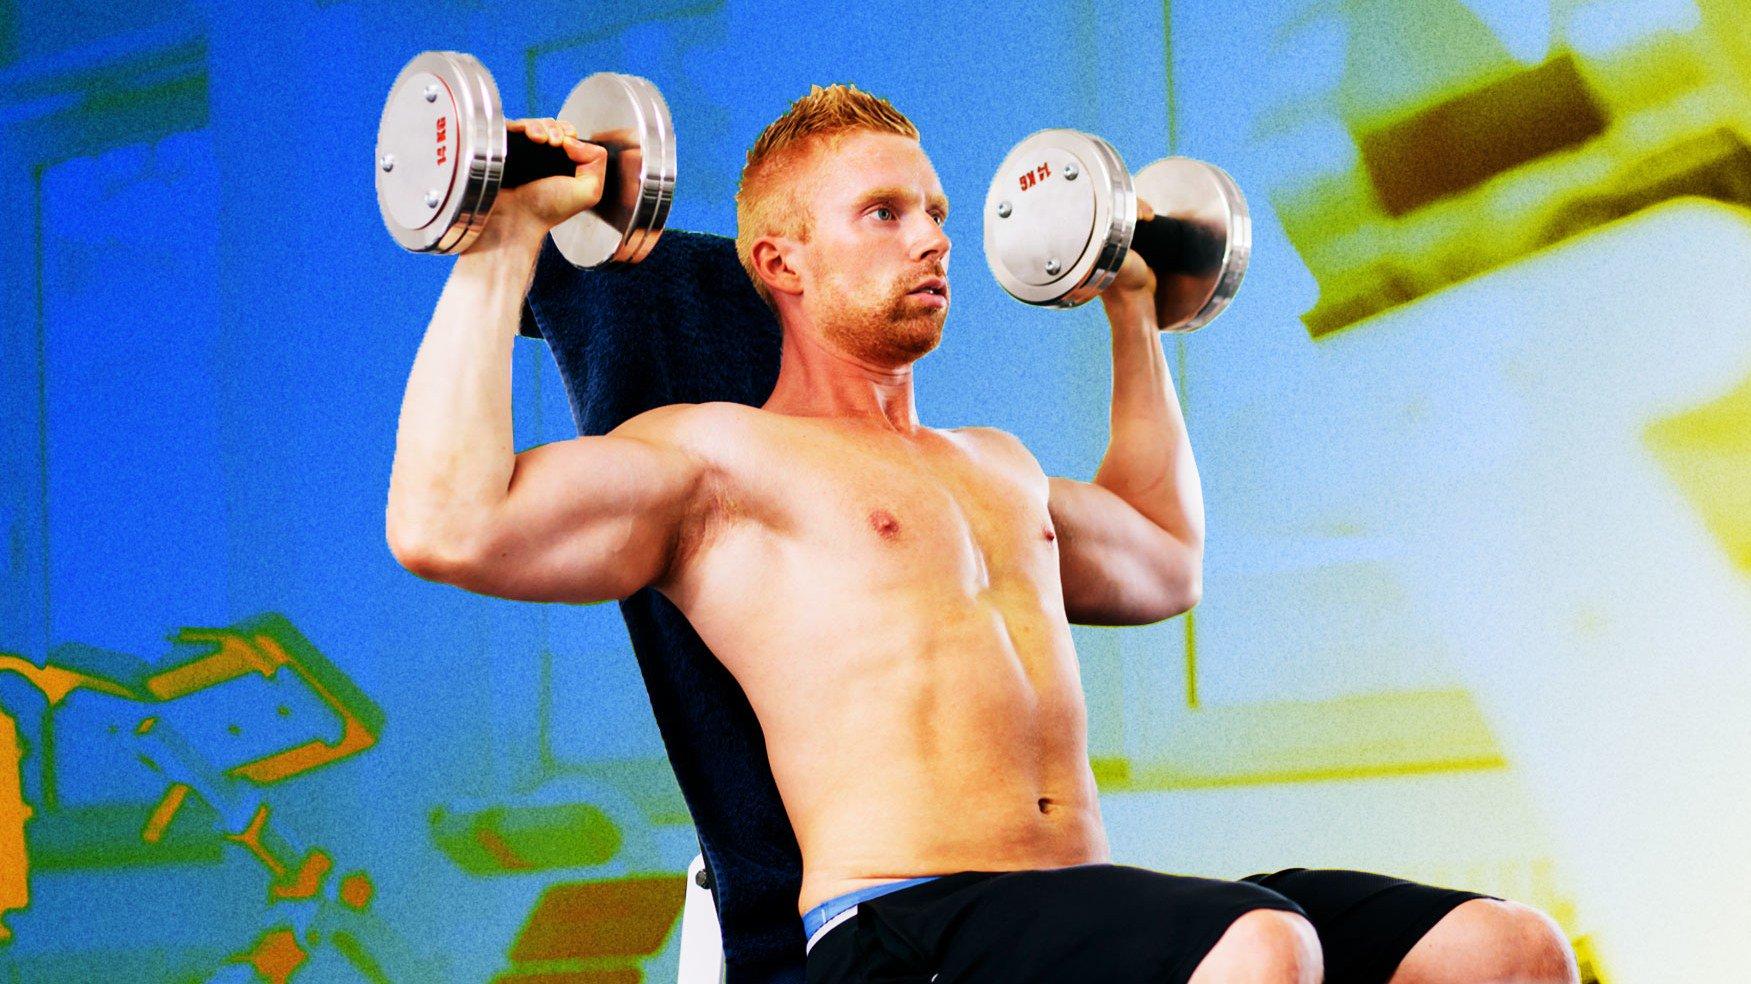 Sexier shoulders can be yours with a few simple tweaks https://t.co/XADaVhMGk7 https://t.co/AVSIOTwy6r